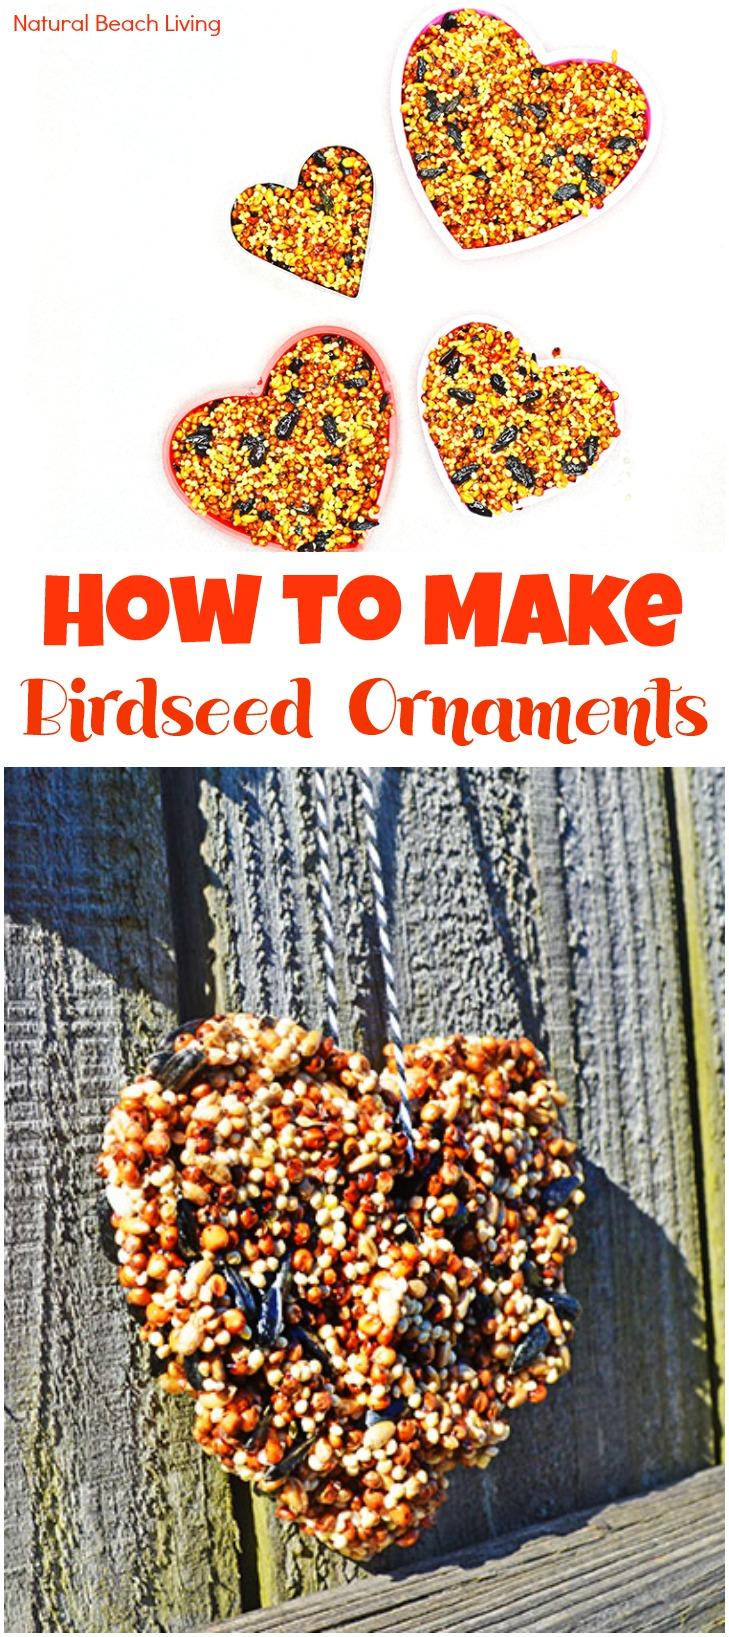 Easy Homemade Bird Seed Ornaments Recipe Natural Beach